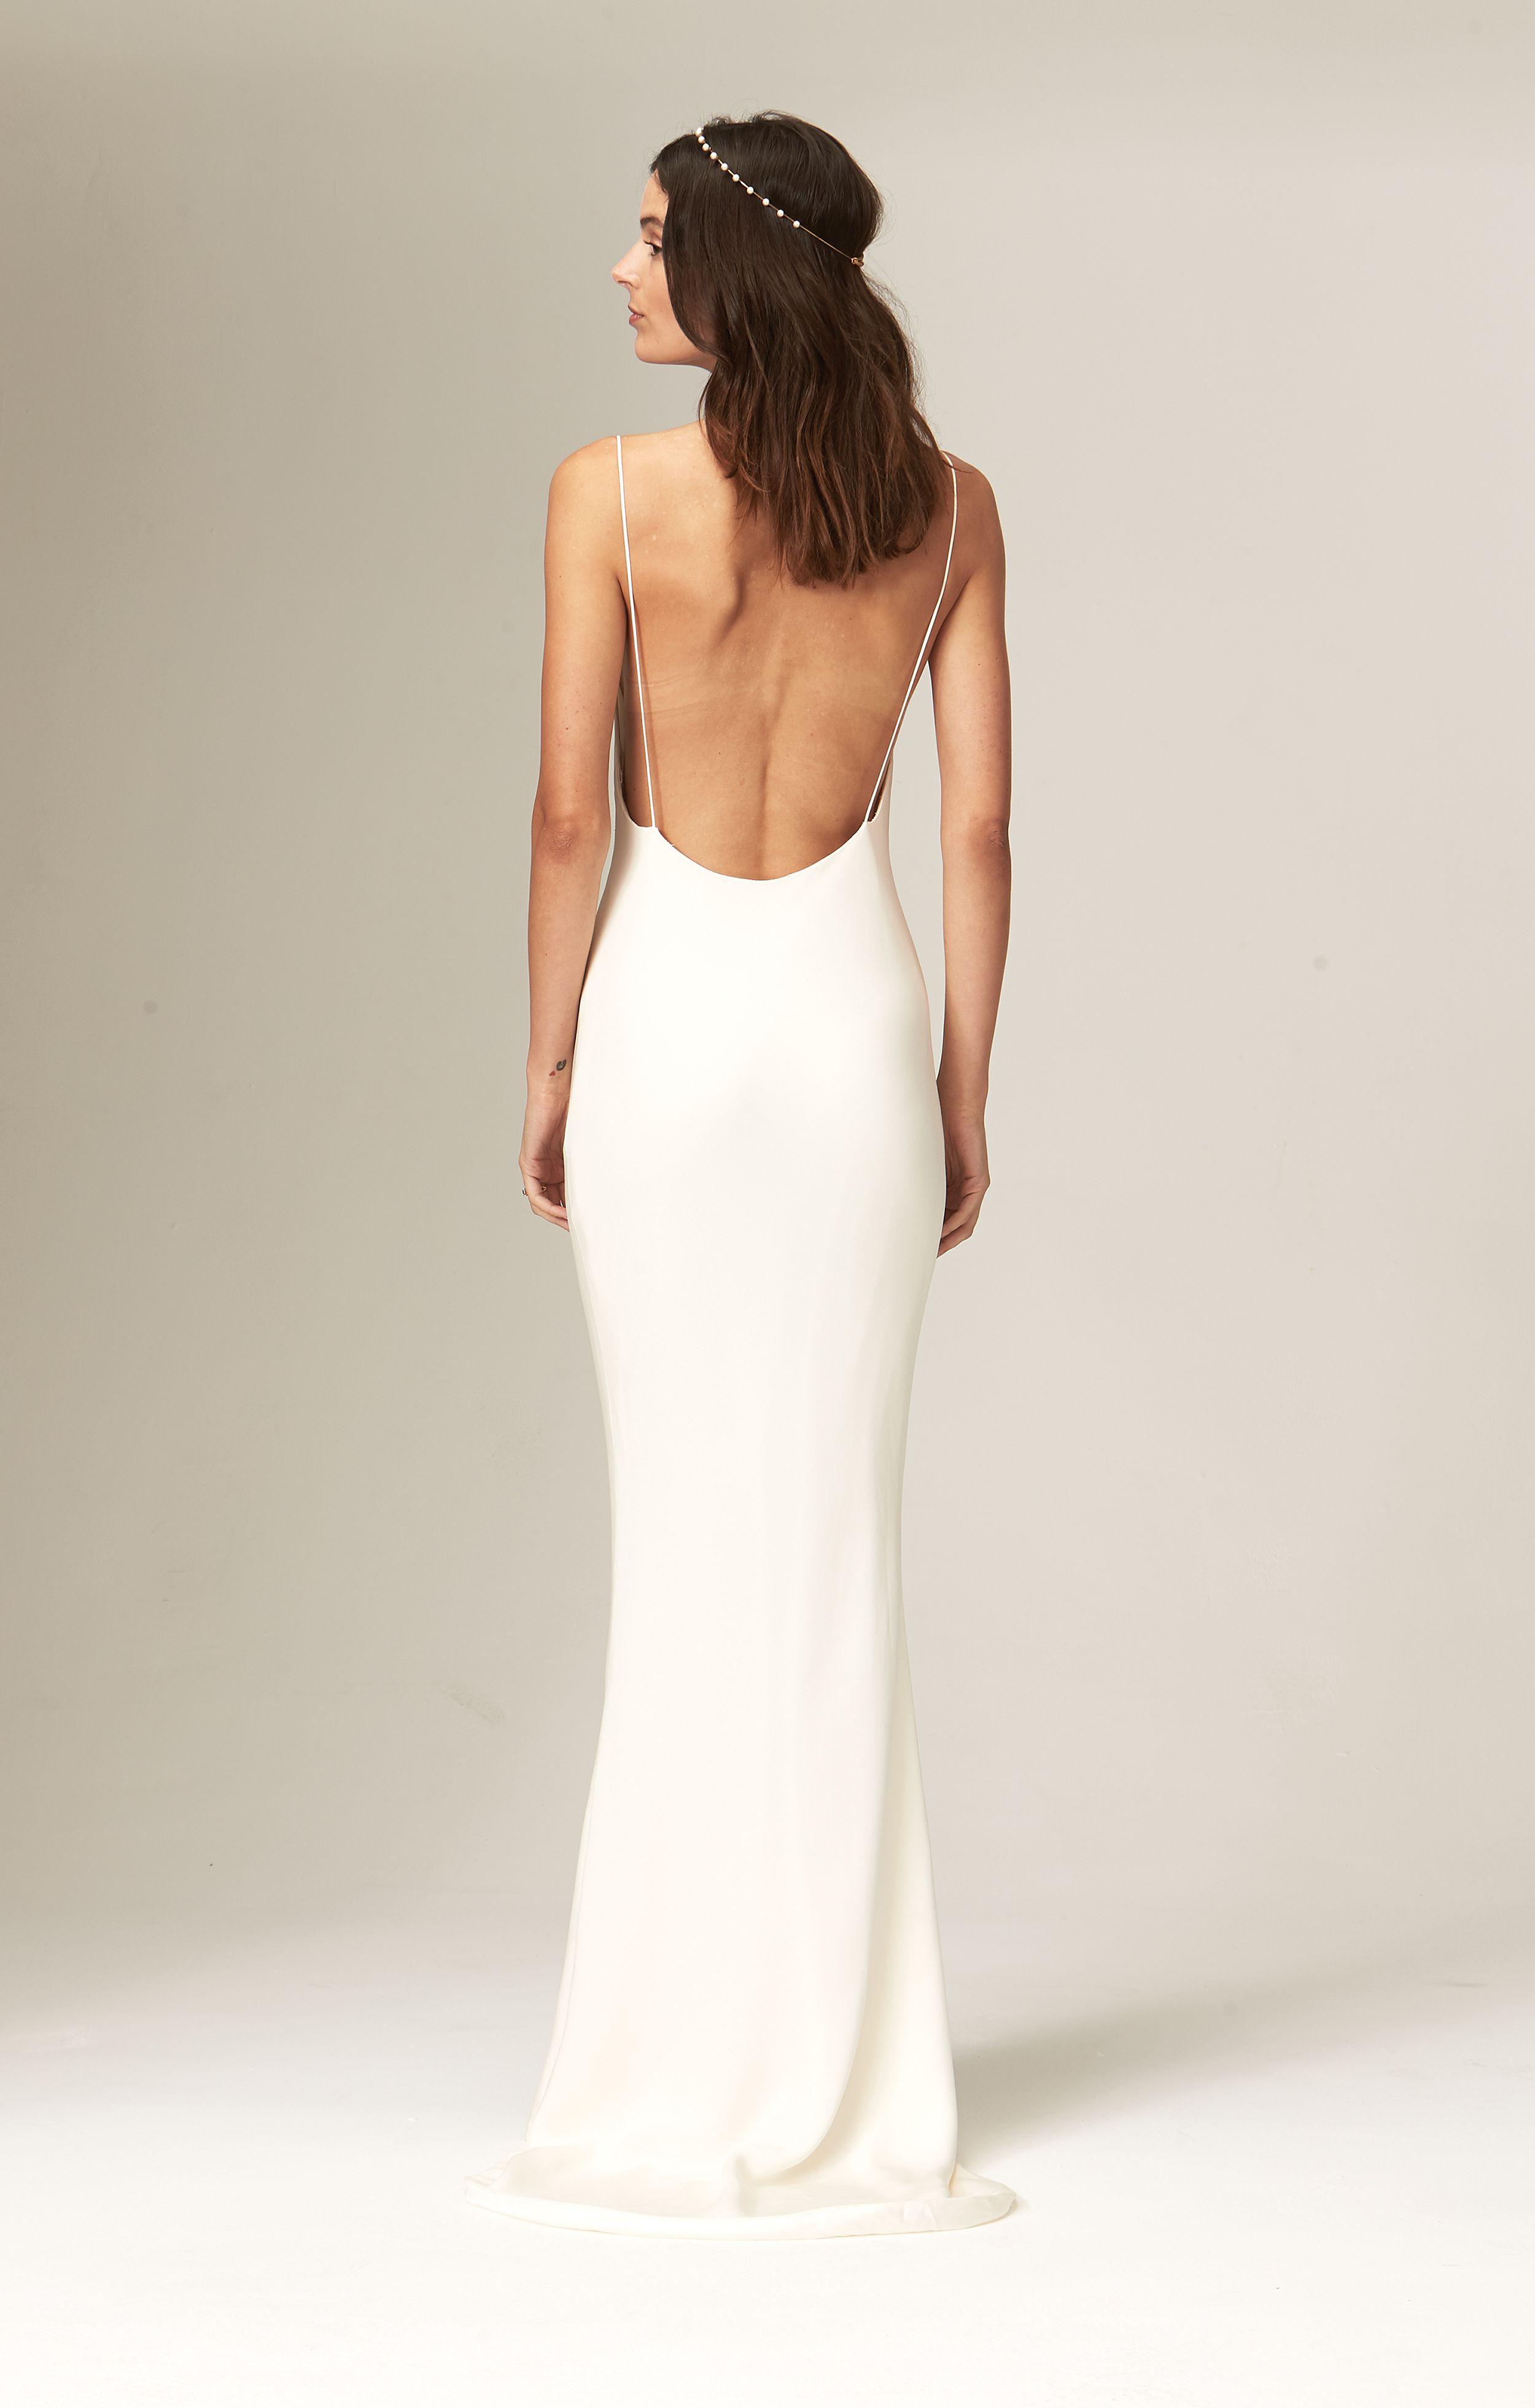 Chloe Savannah Miller Elegant And Understated Bridal Wedding Dress Low Back Cowl Neck Wedding Dress Column Wedding Dress